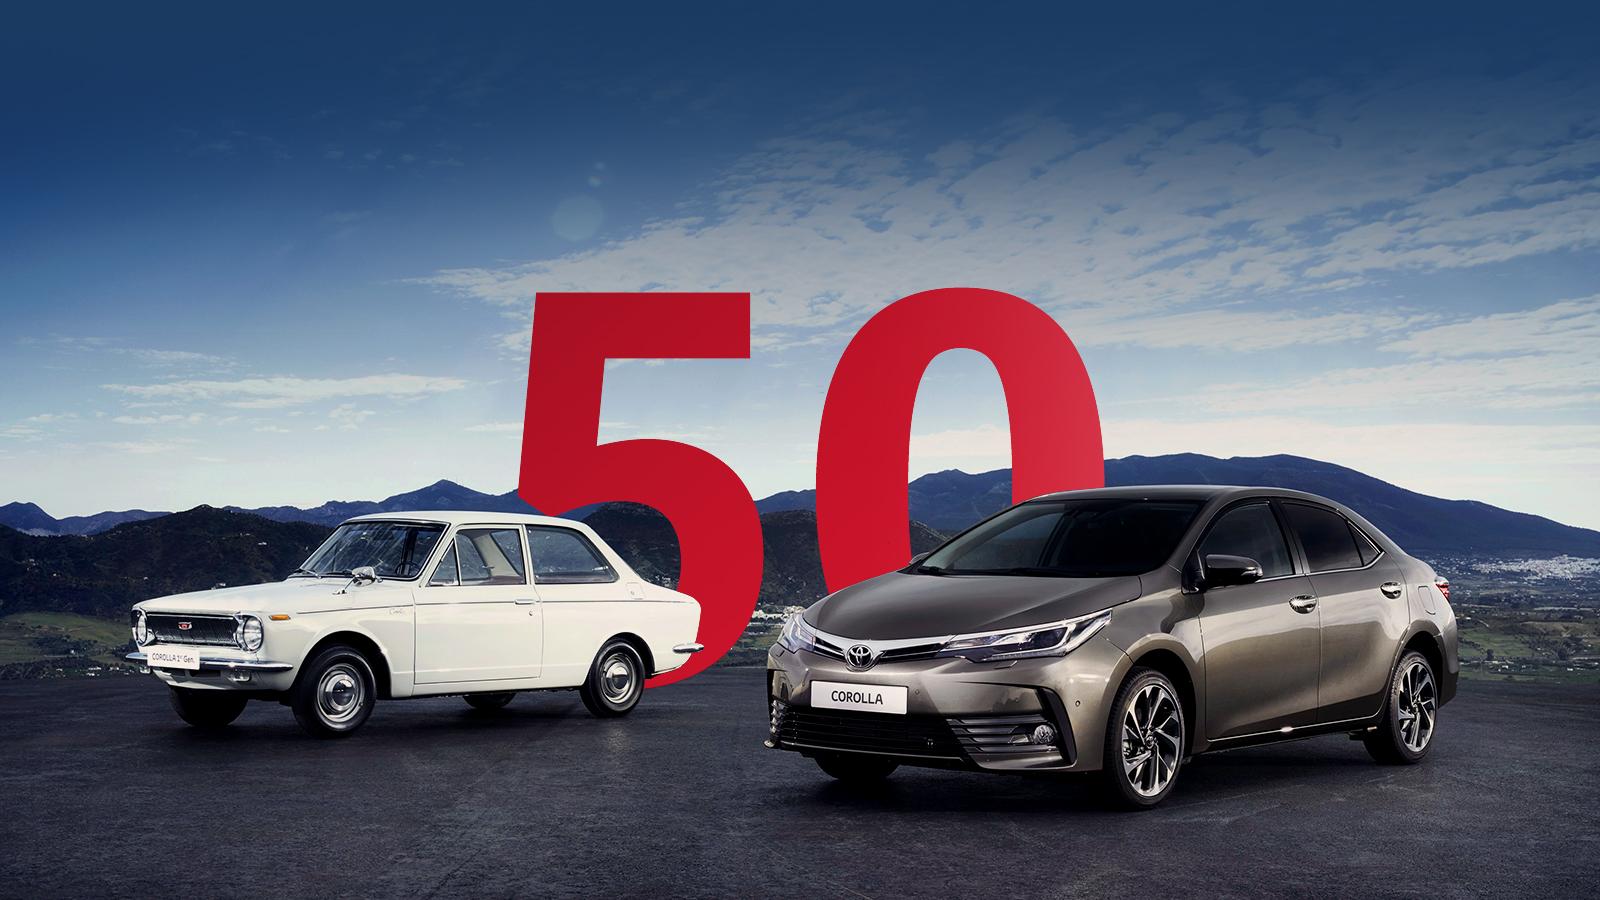 50 years toyota corolla Το Toyota Corolla κλείνει τα 50 του χρόνια και αναπολούμε 11 απροβλημάτιστες γενιές Fun, Toyota, Toyota Corolla, videos, zblog